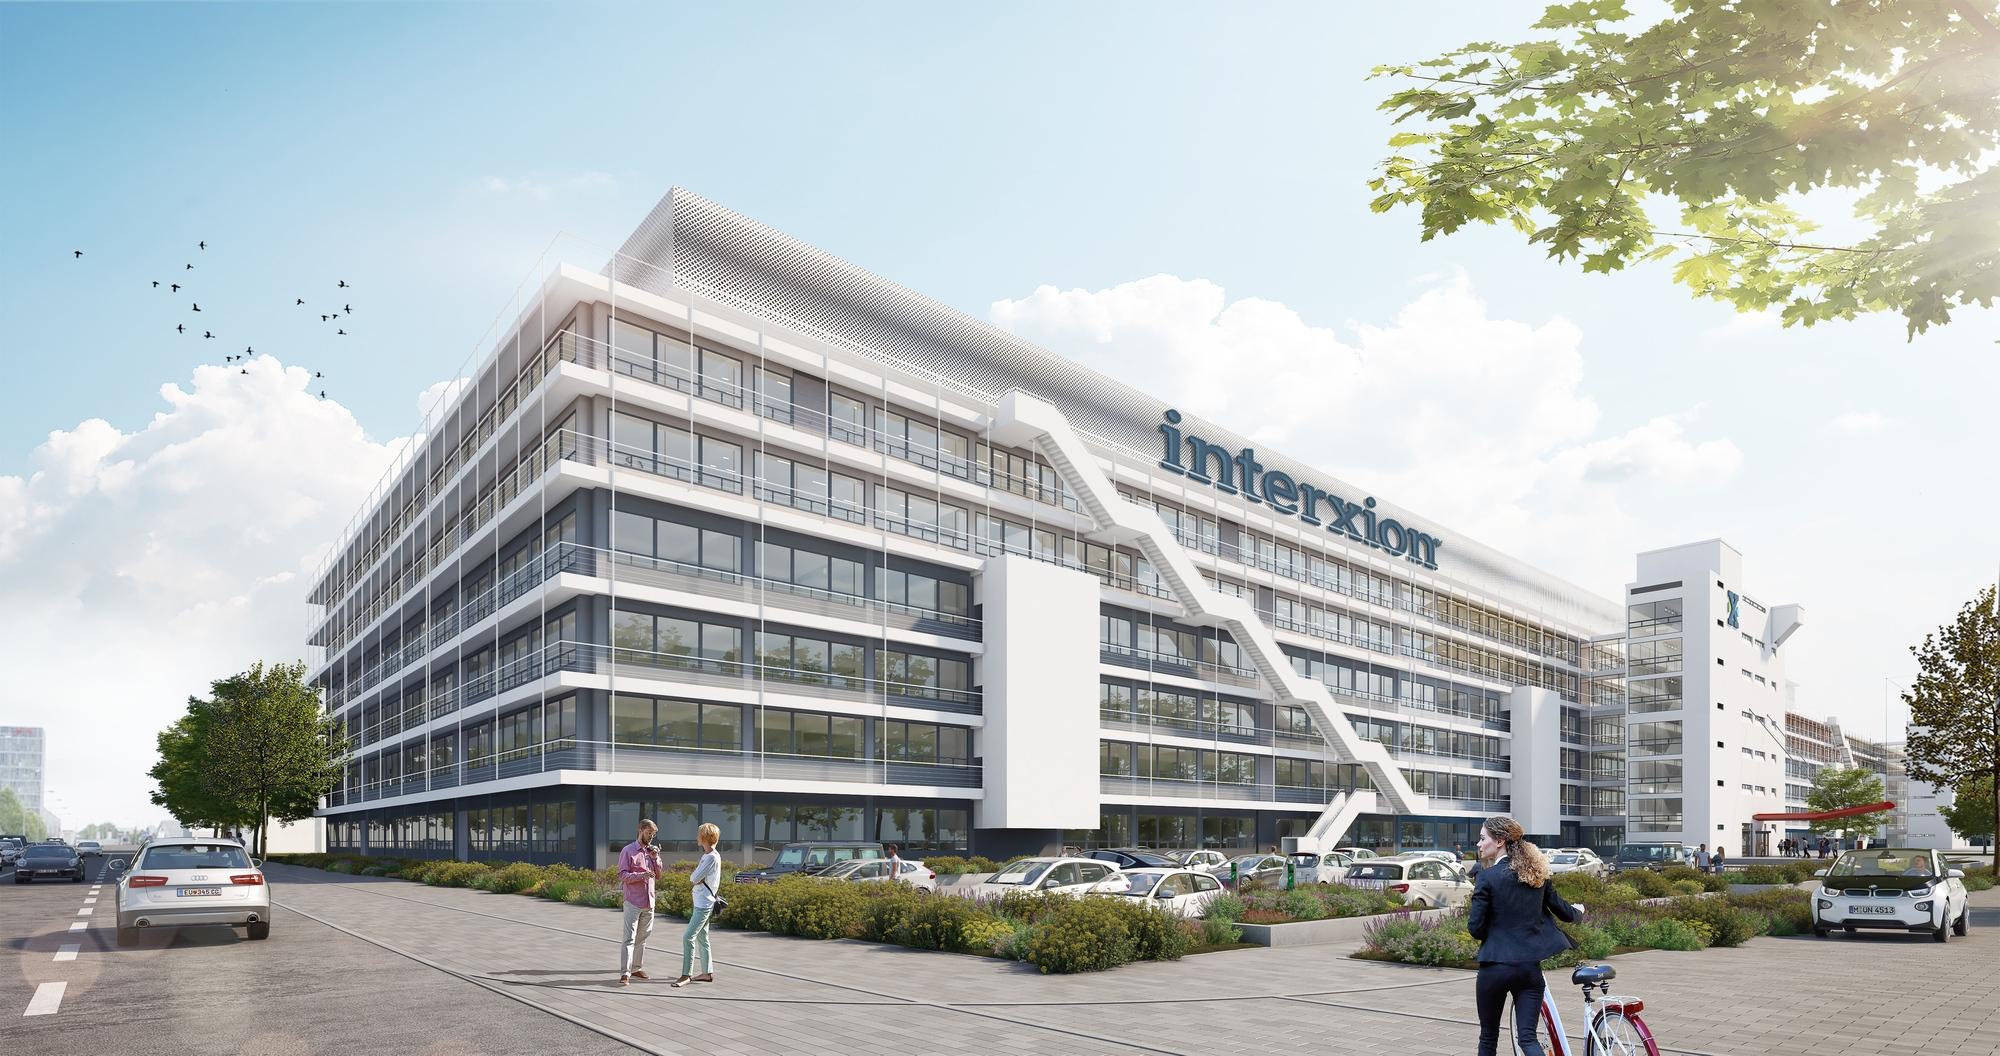 digital_park%20fechenheim_interxion_01.2021_01.jpg